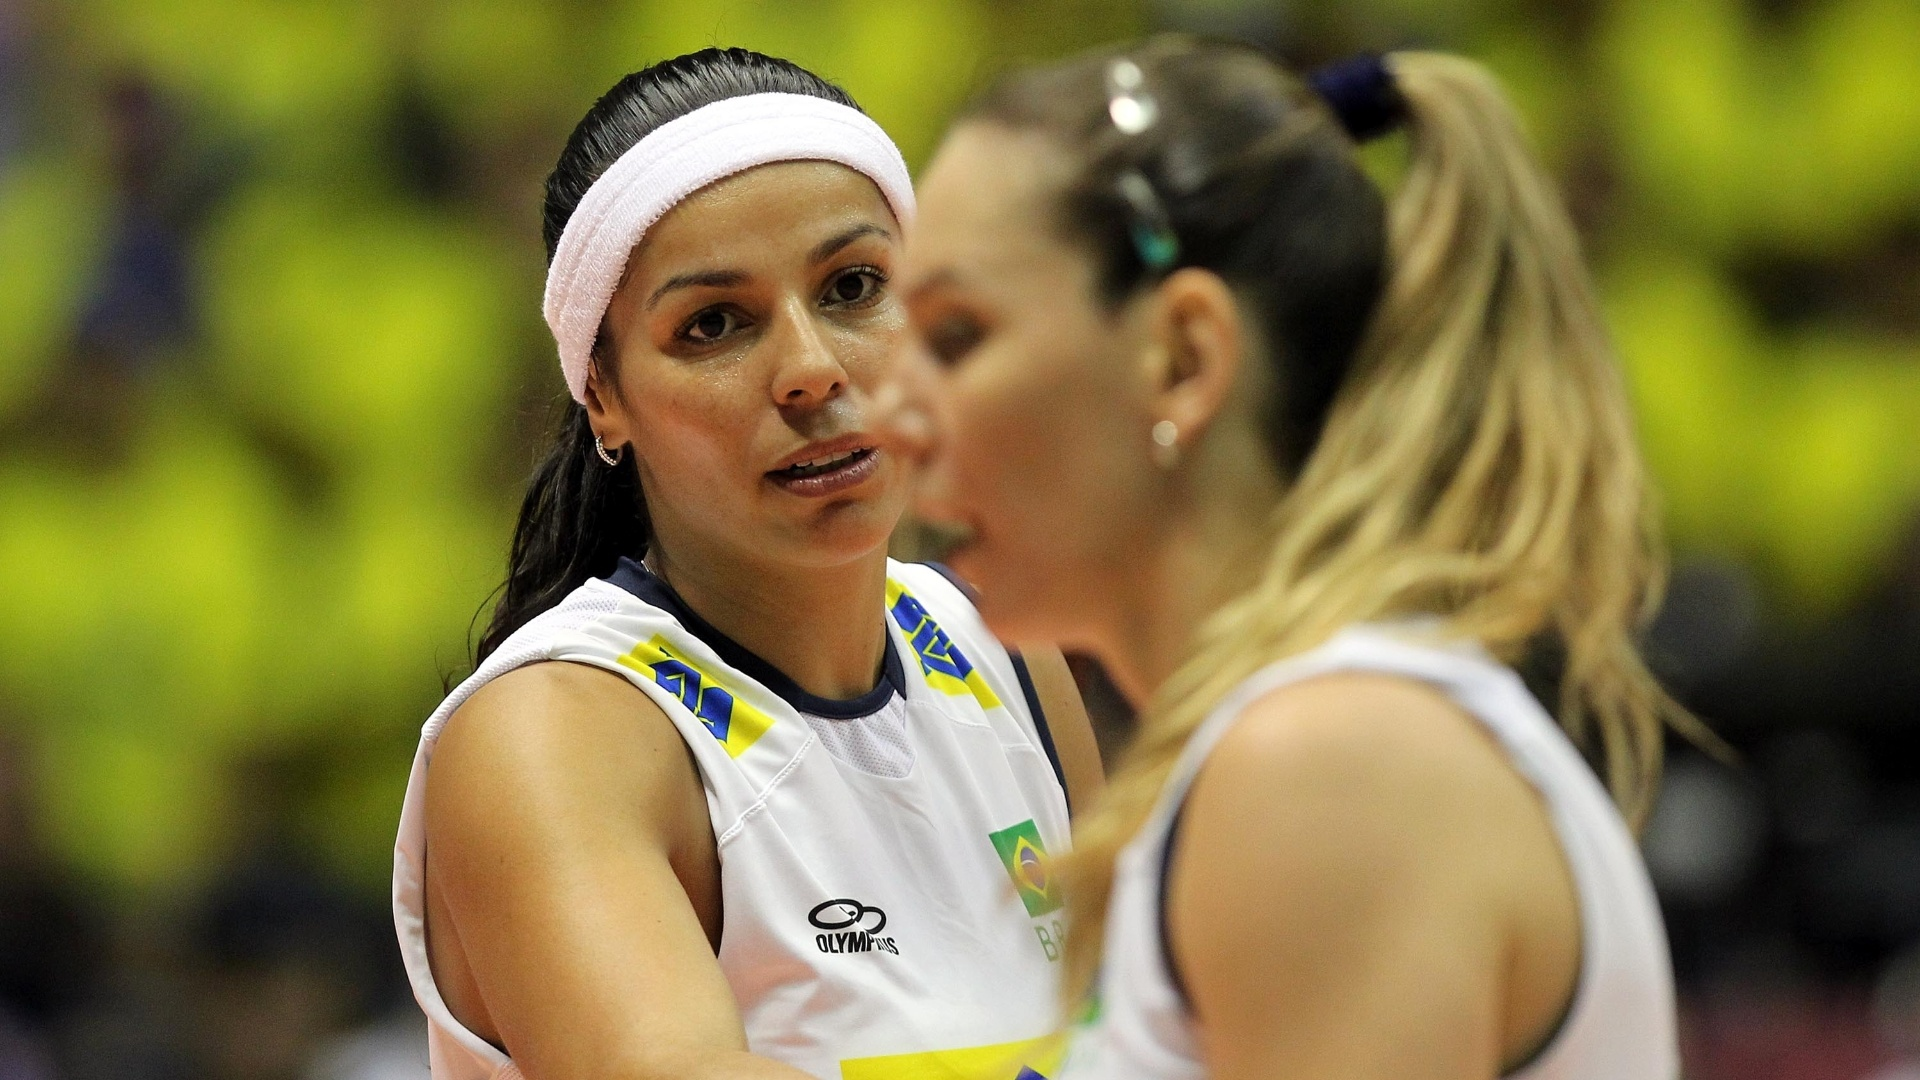 Fabíola e Paula Pequeno lamentam falha brasileira durante a partida contra os Estados Unidos